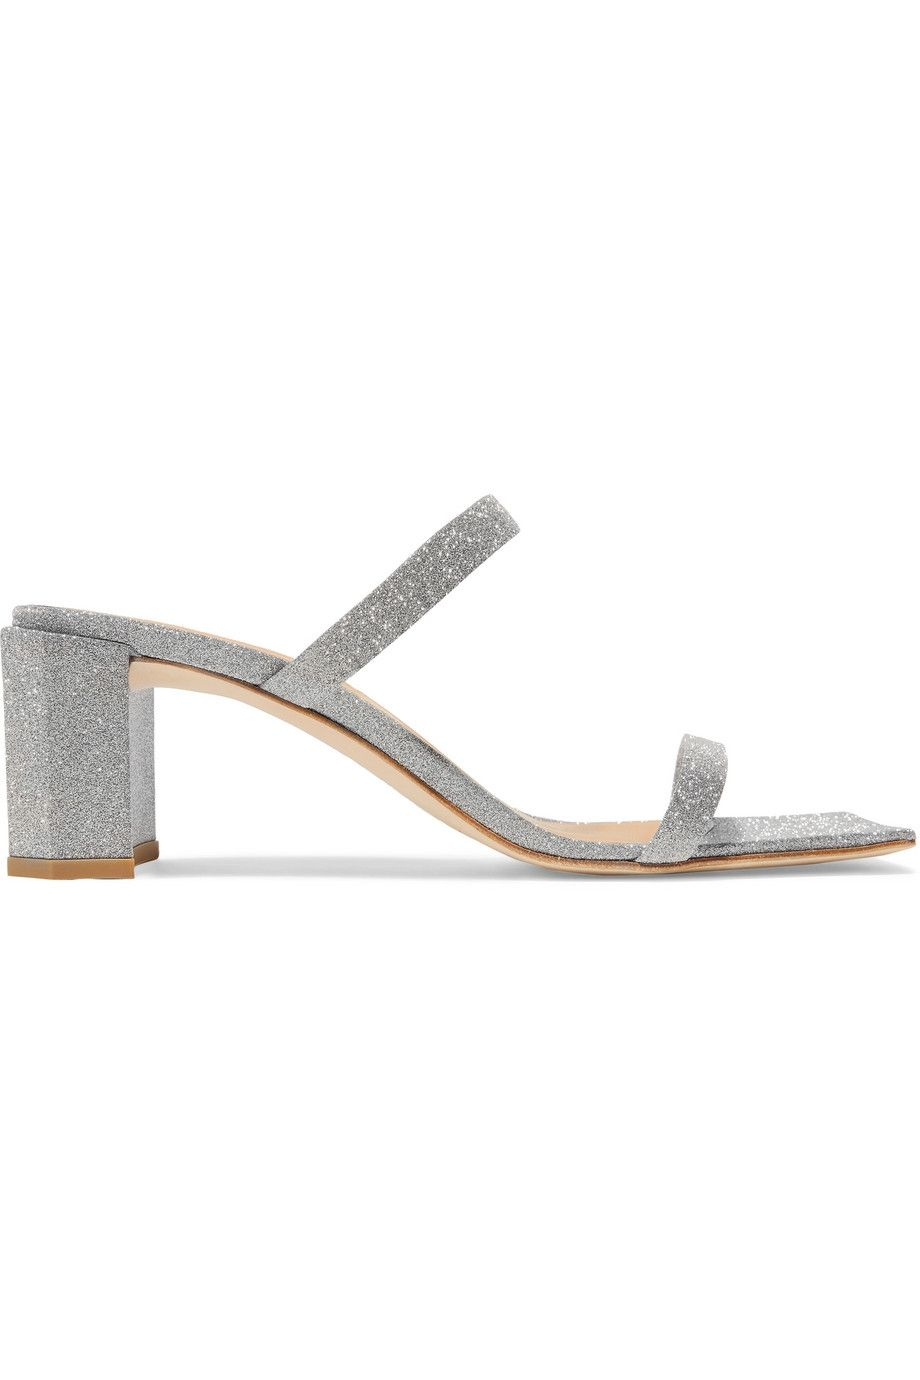 Cutest Brands Women Best The Sandal For Sandals SUMGqzVp